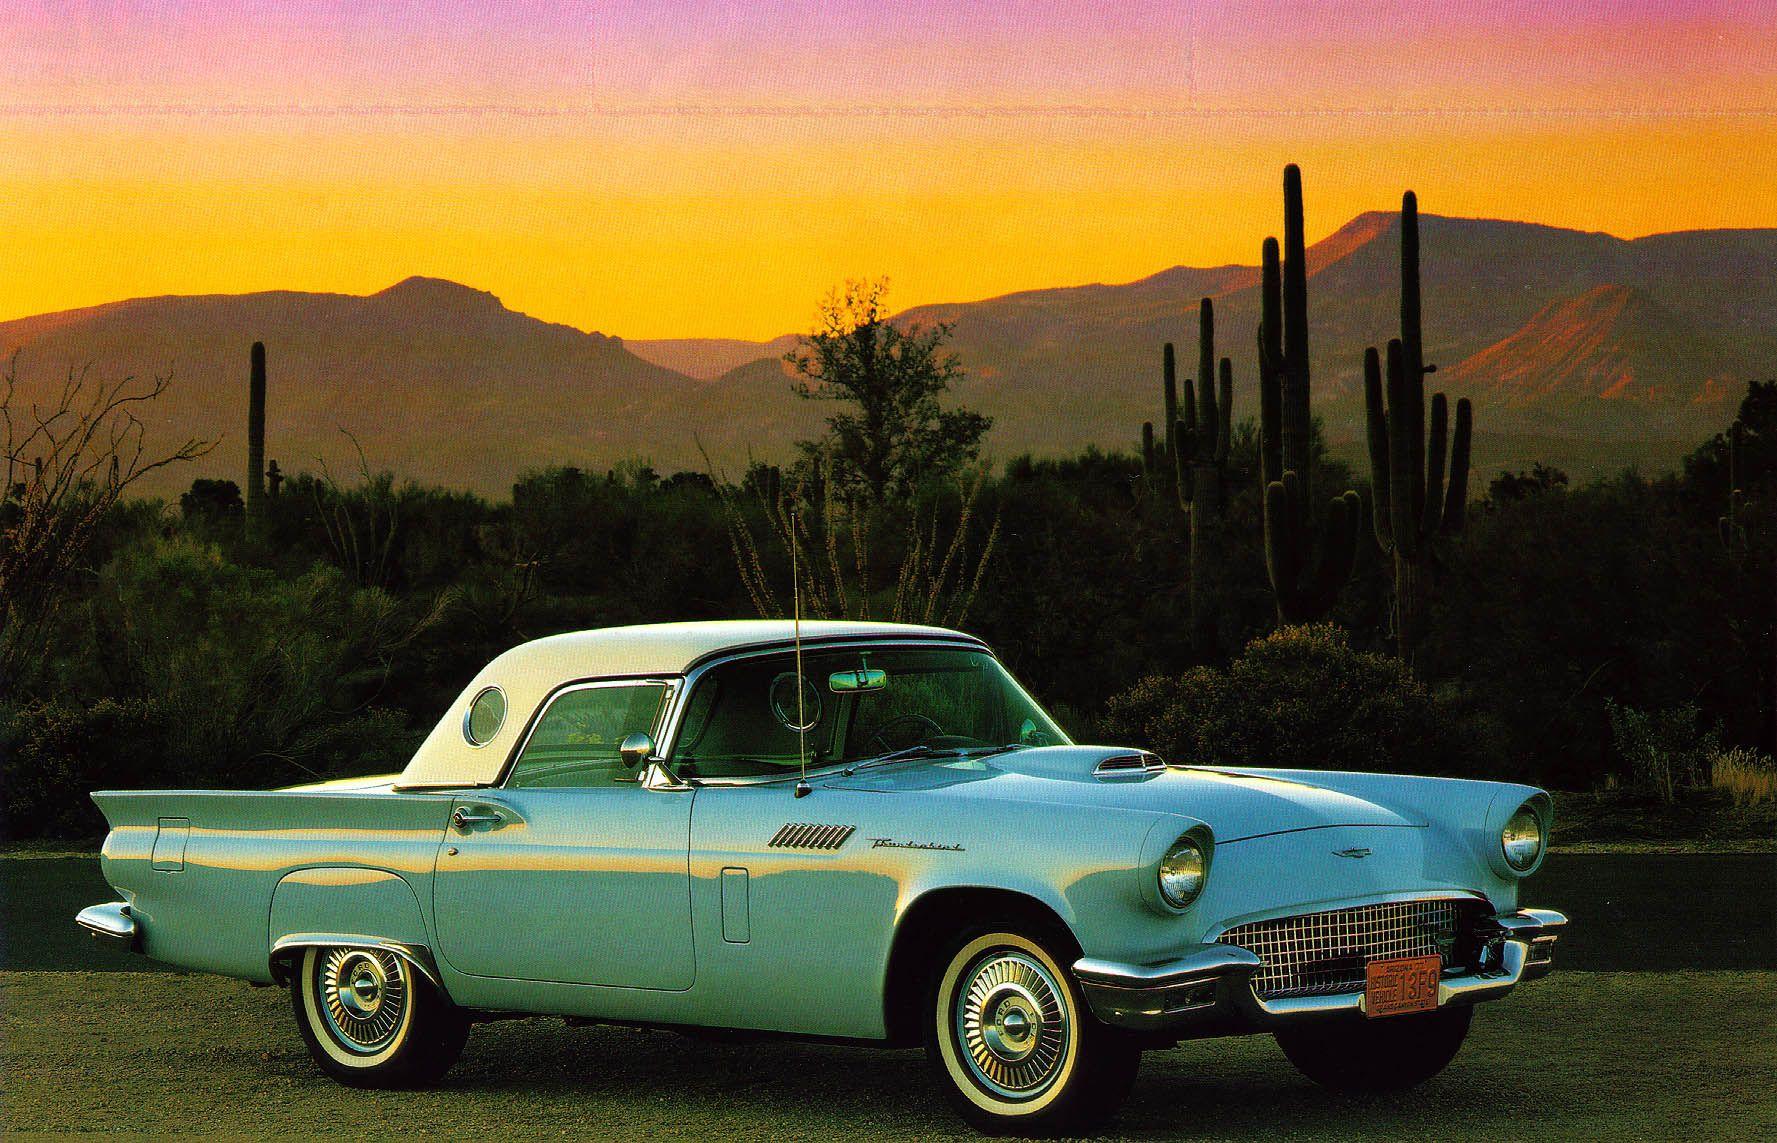 1957 thunderbird cars i like pinterest. Black Bedroom Furniture Sets. Home Design Ideas